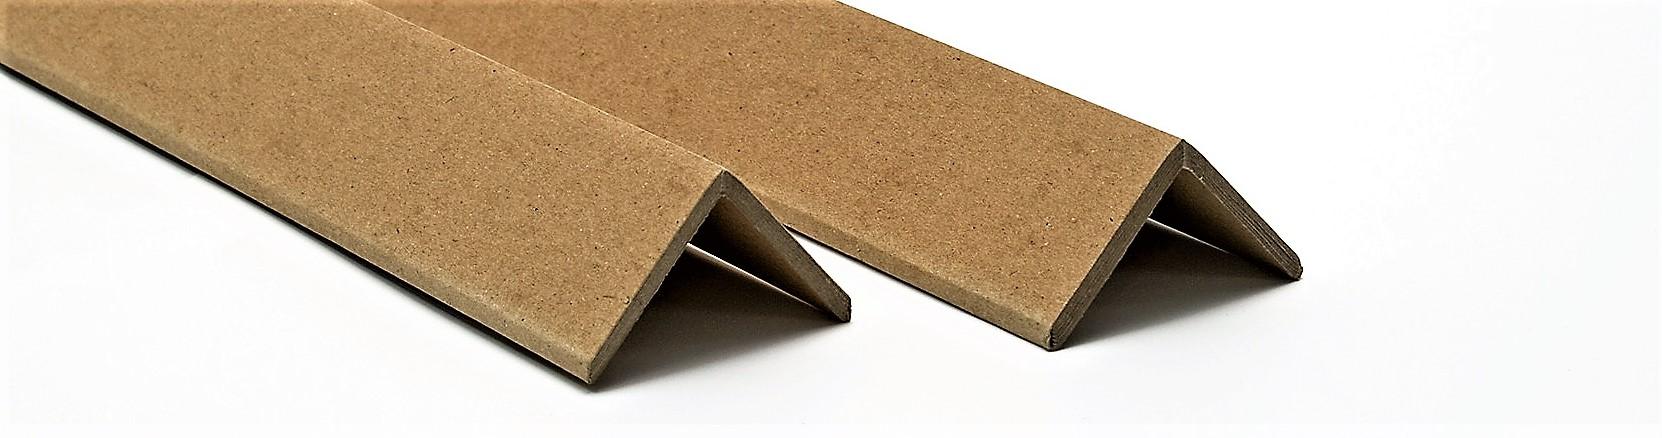 Cornières carton recyclable